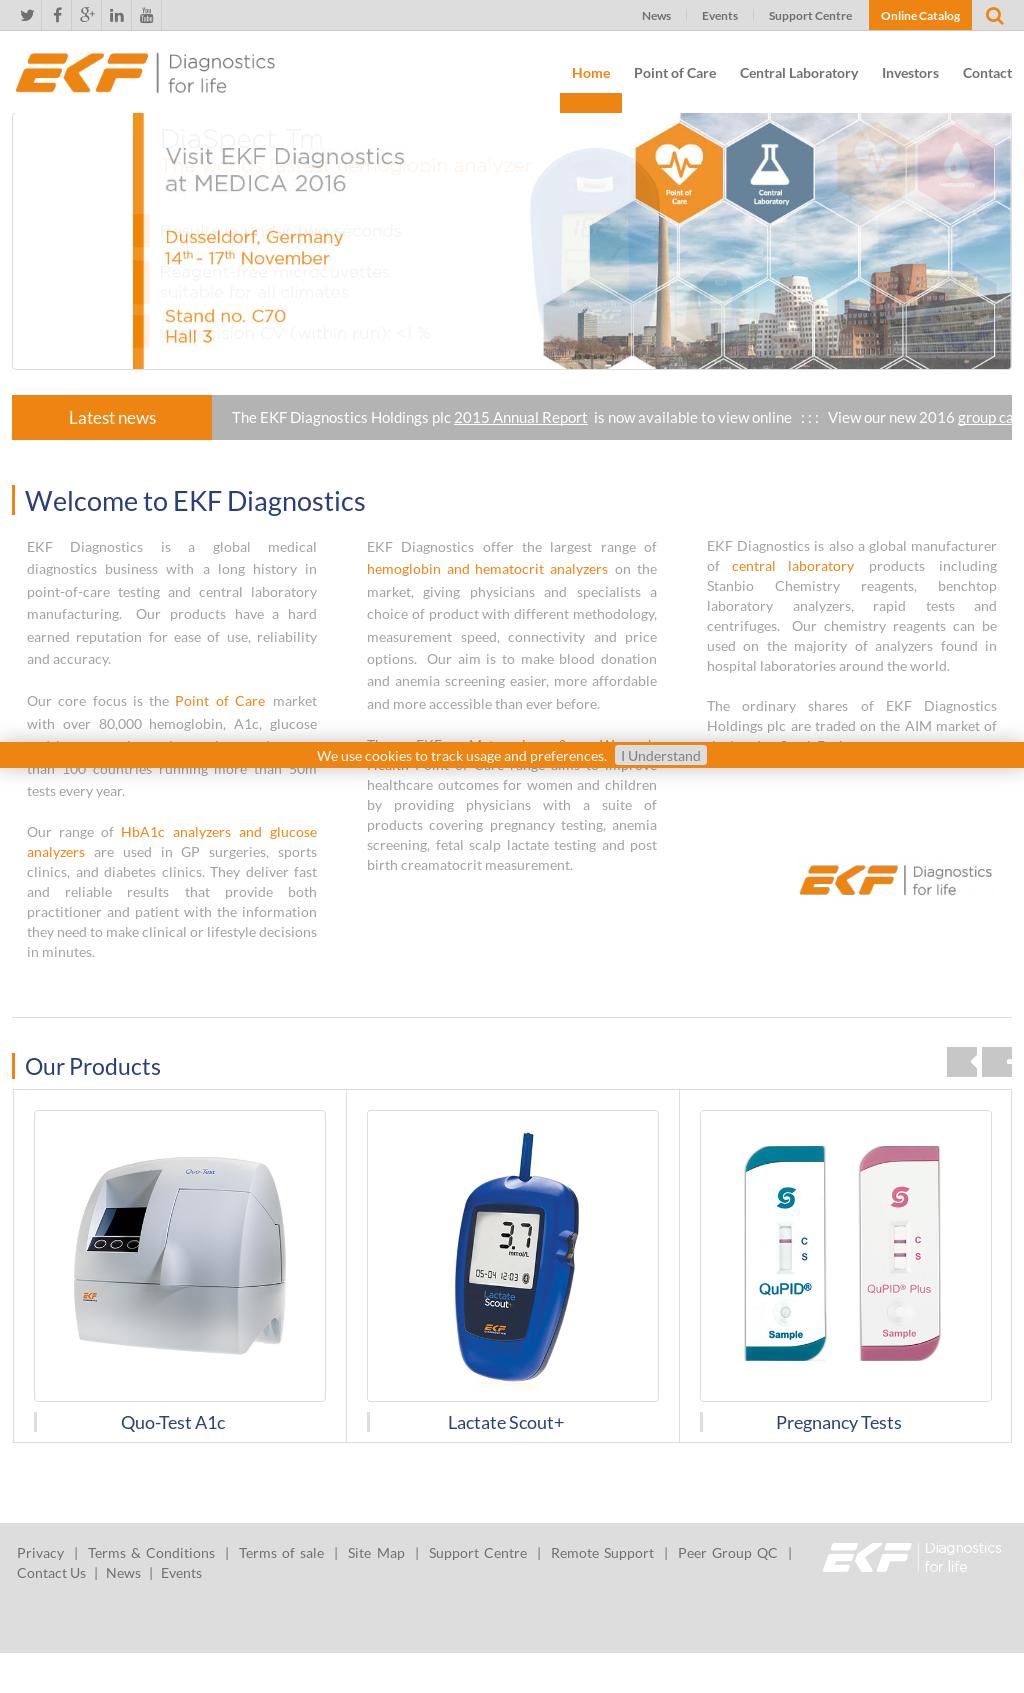 EKF Diagnostics Competitors, Revenue and Employees - Owler